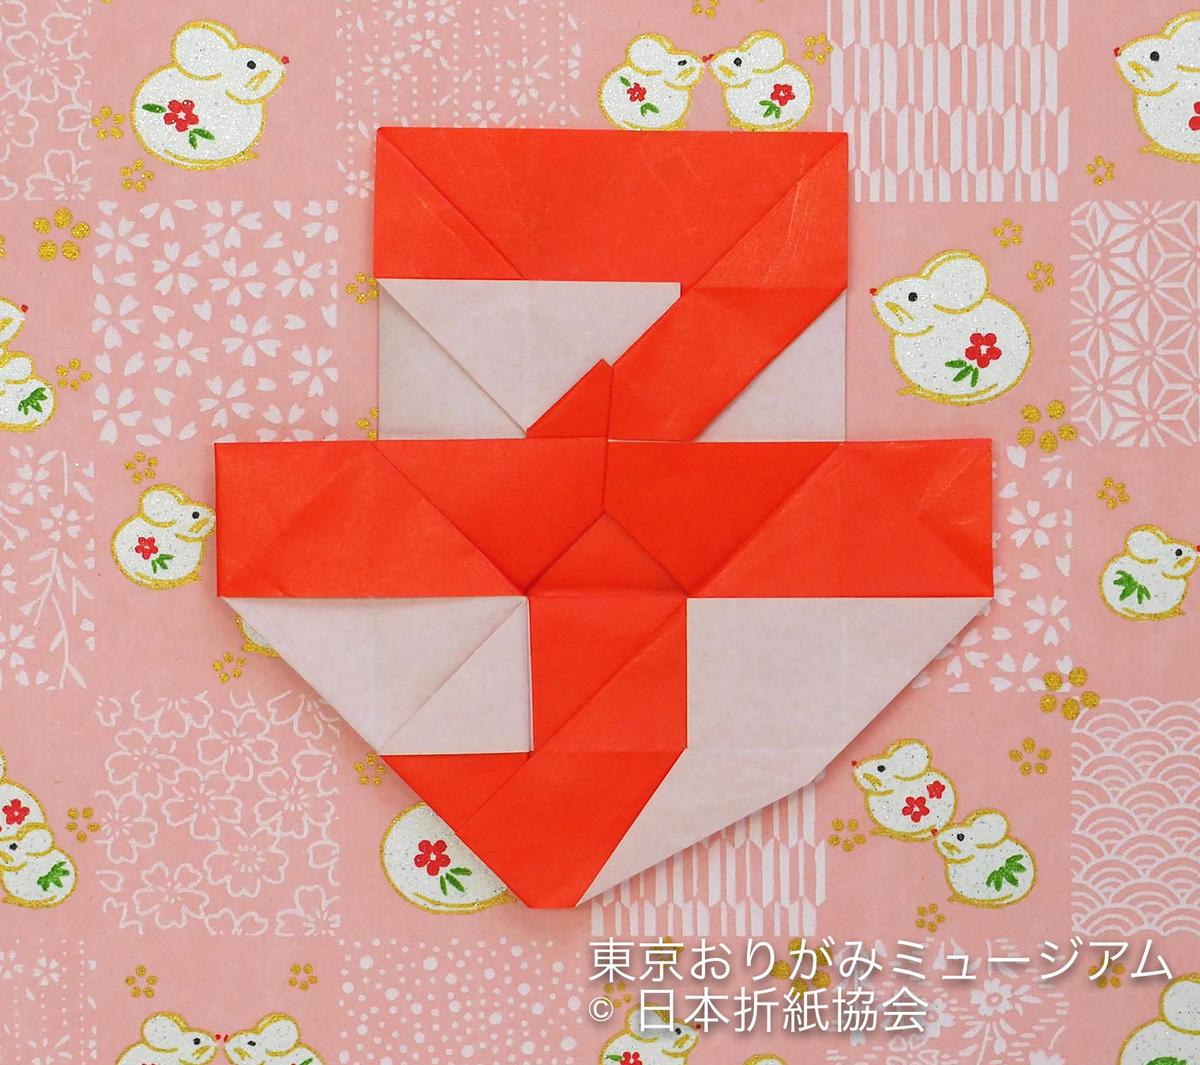 f:id:origami-noa:20200107182044j:plain